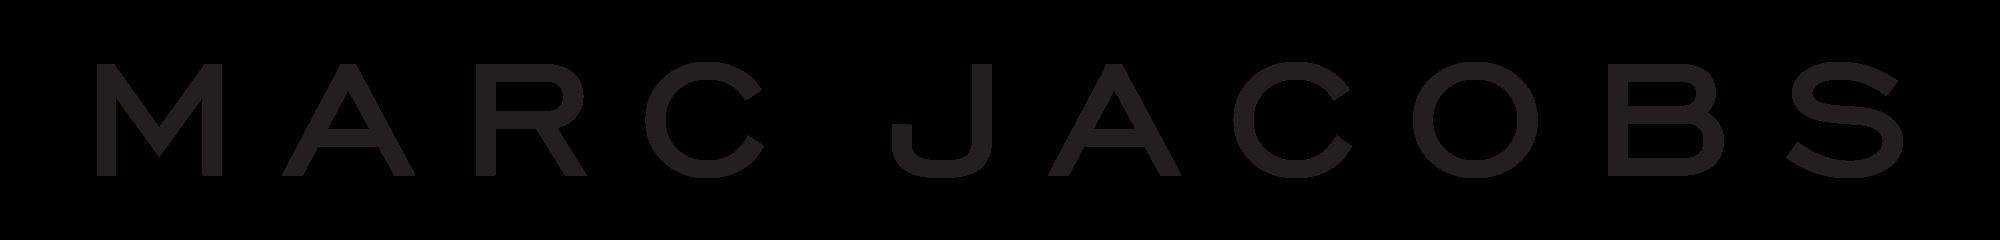 Image result for marc jacobs eyewear logo